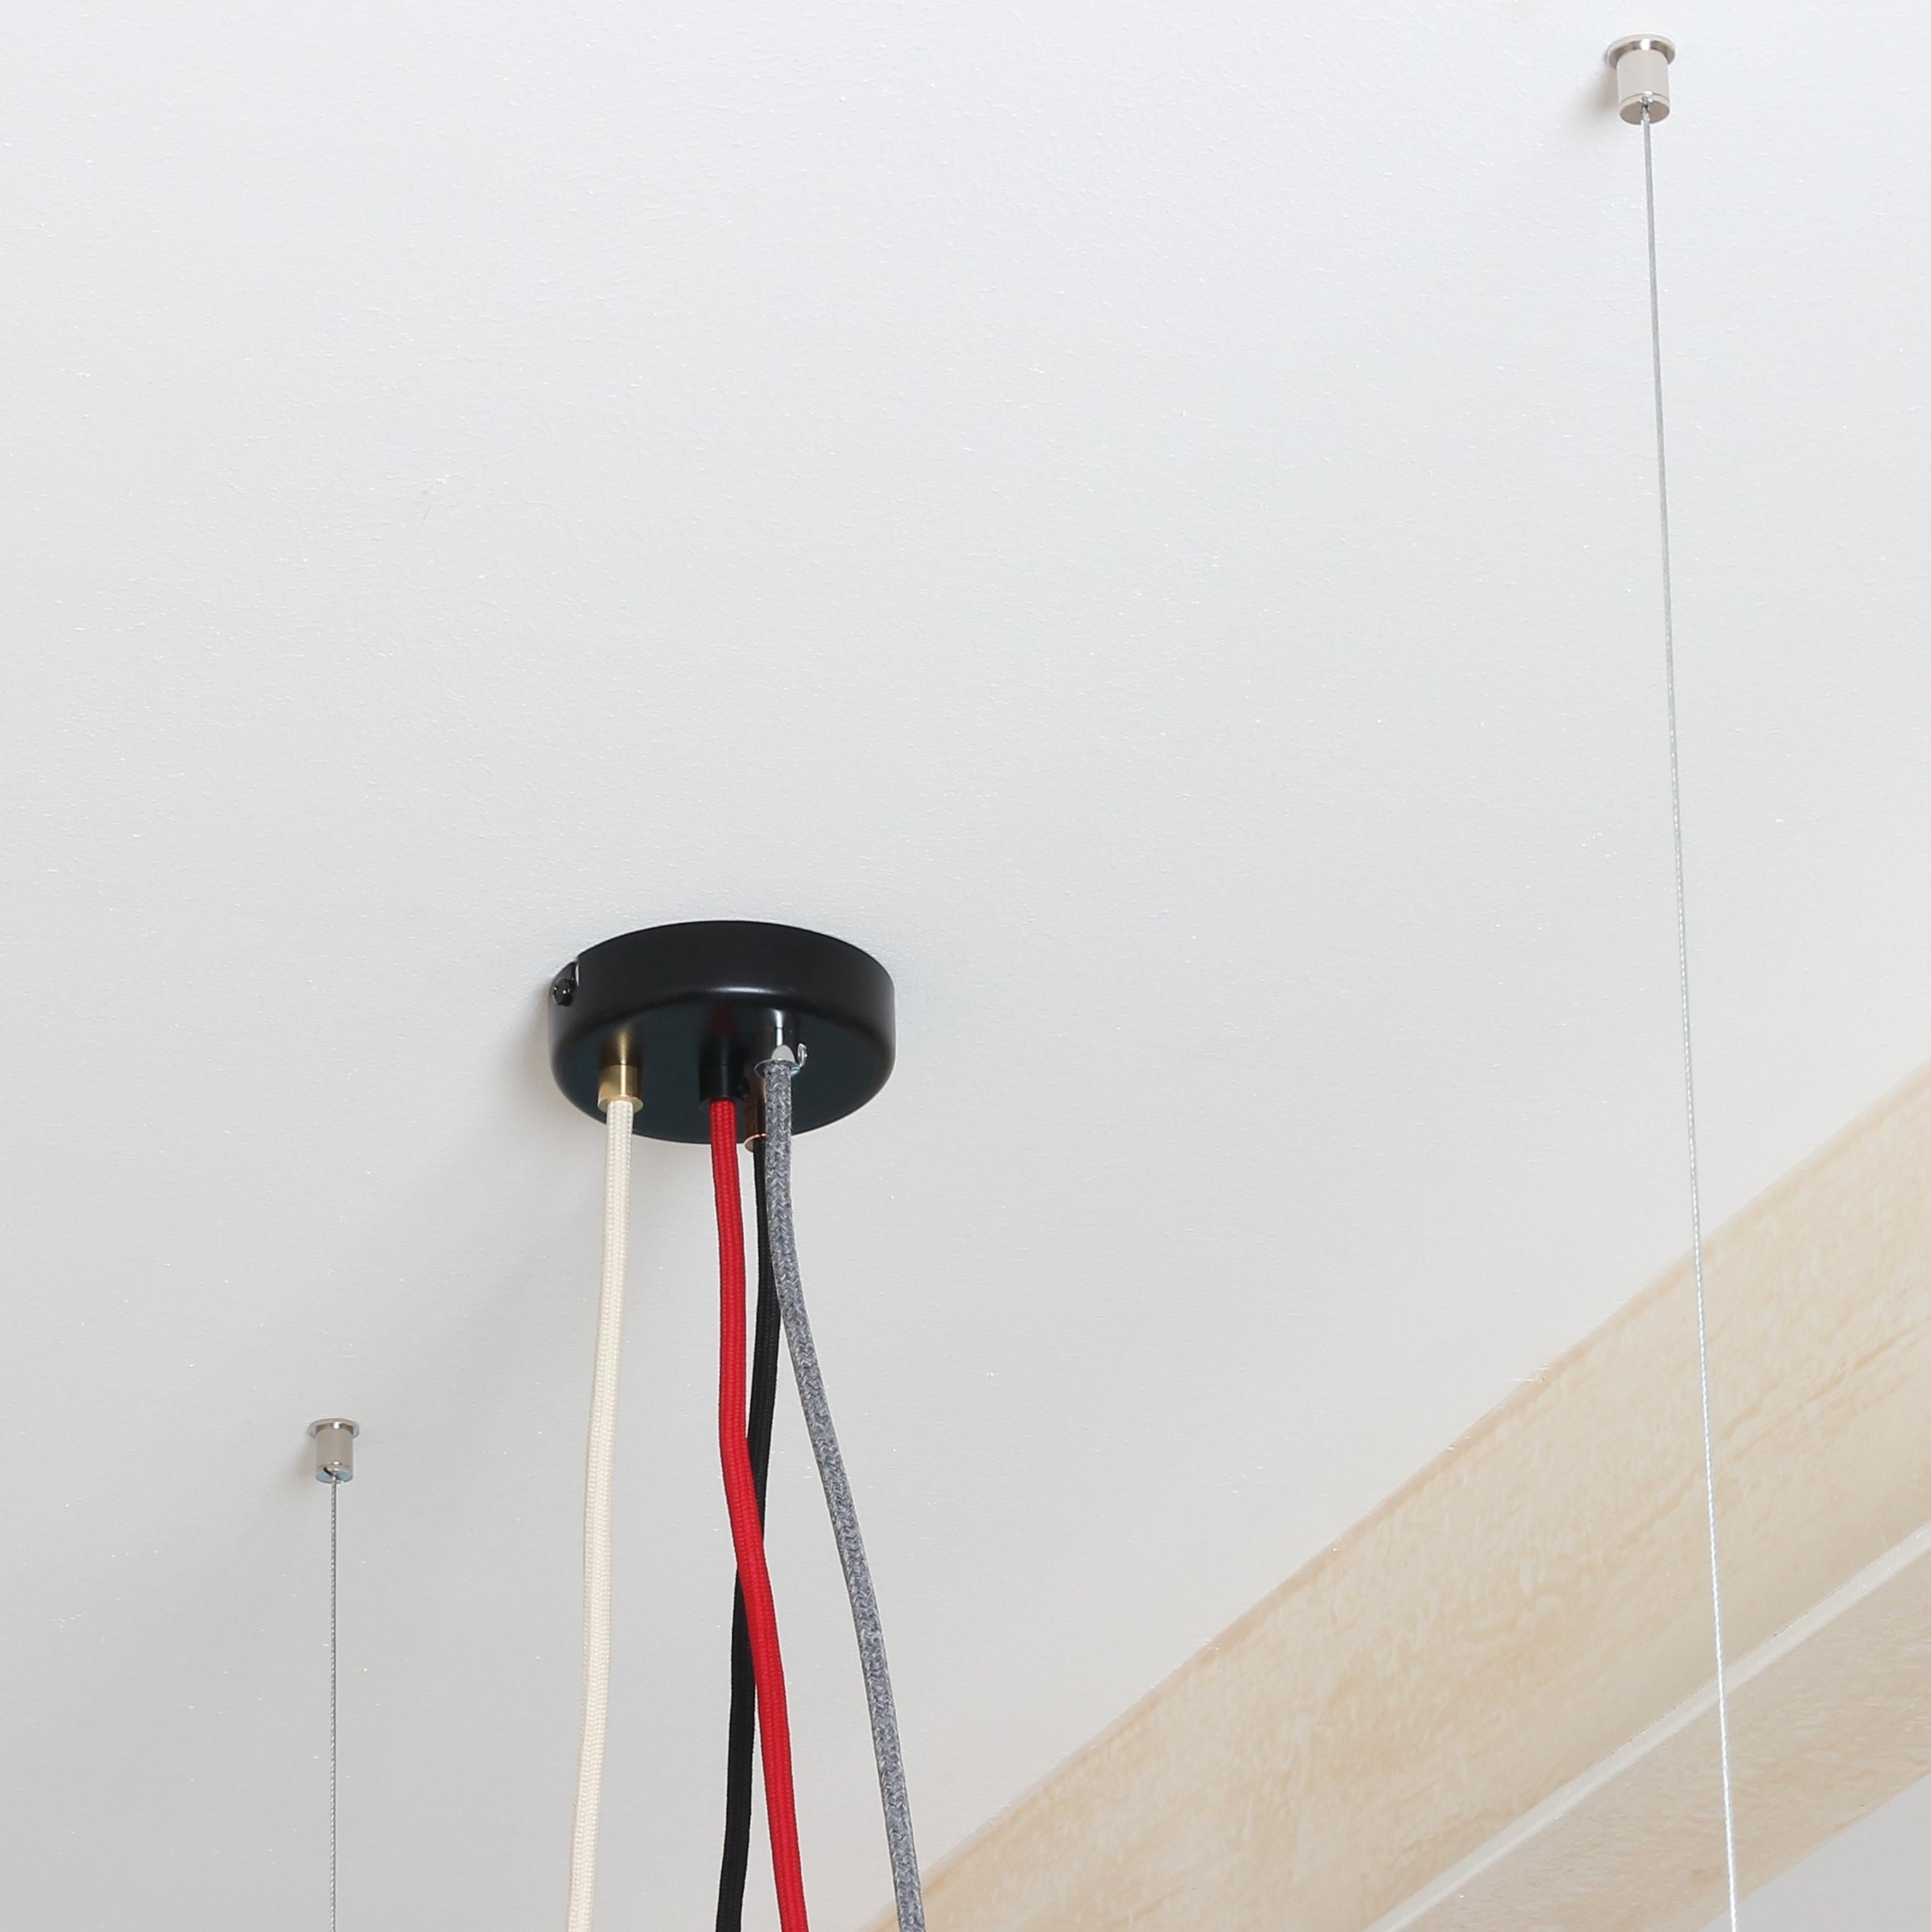 Lampen Baldachin Ast Lampe Selber Bauen 6 Radio Kolsch Hamburg